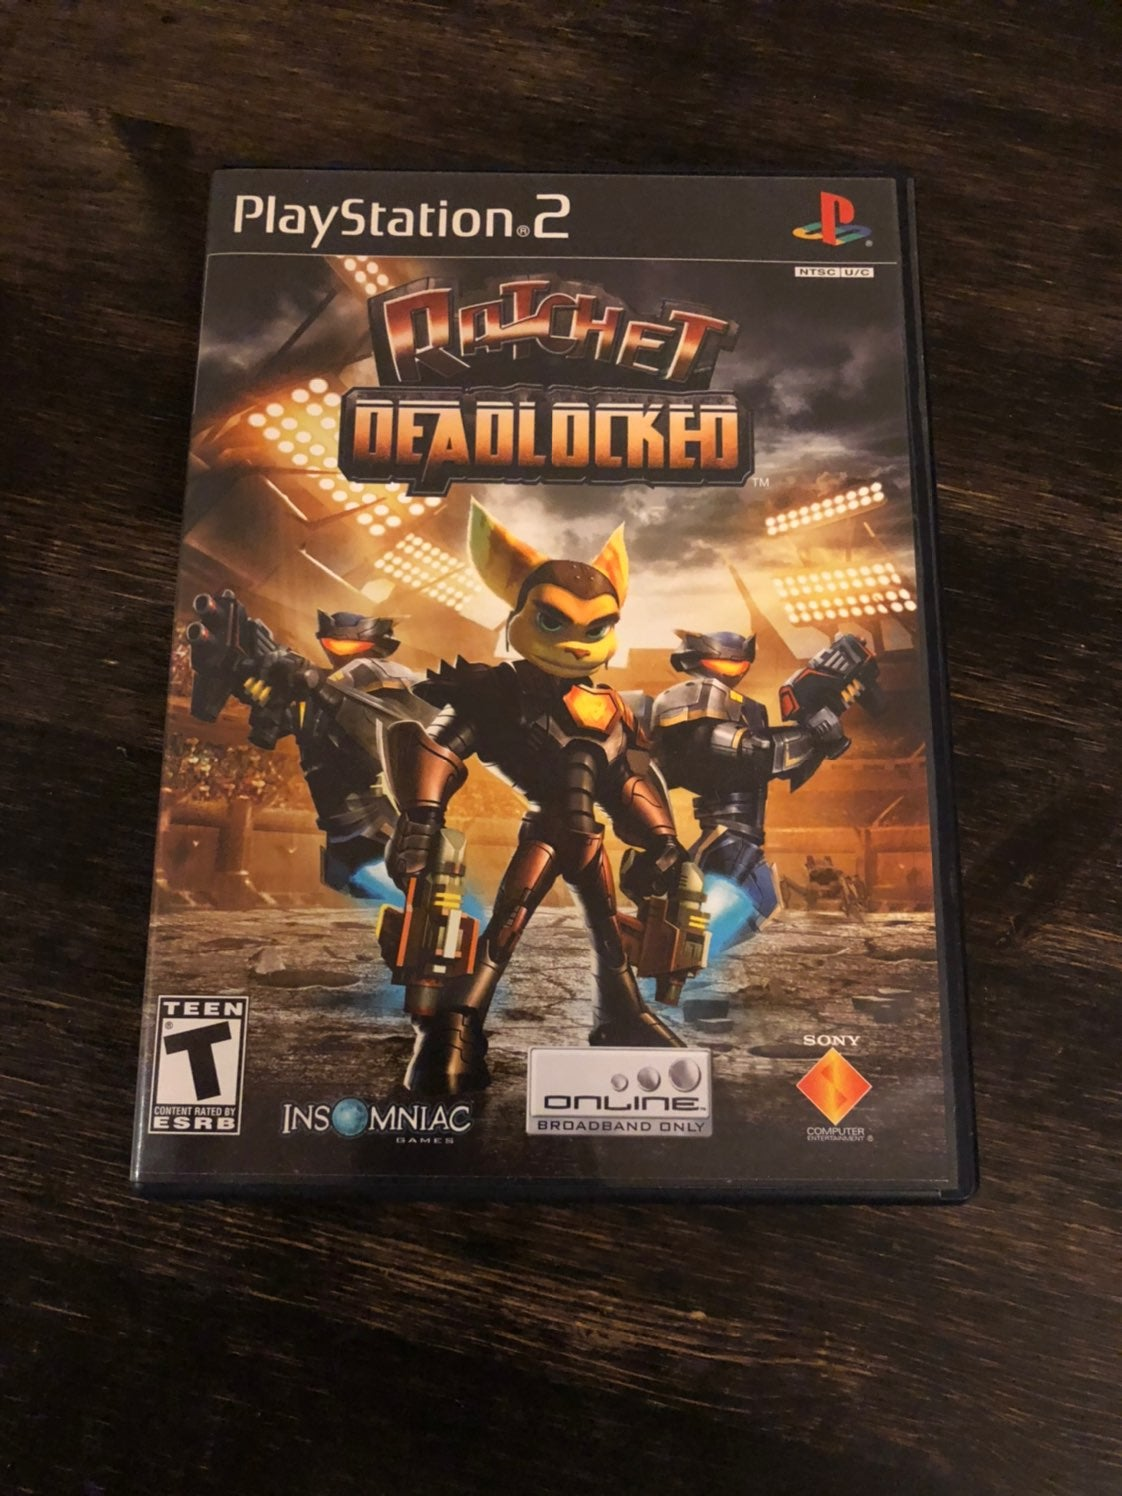 PS2 Ratchet Deadlocked game